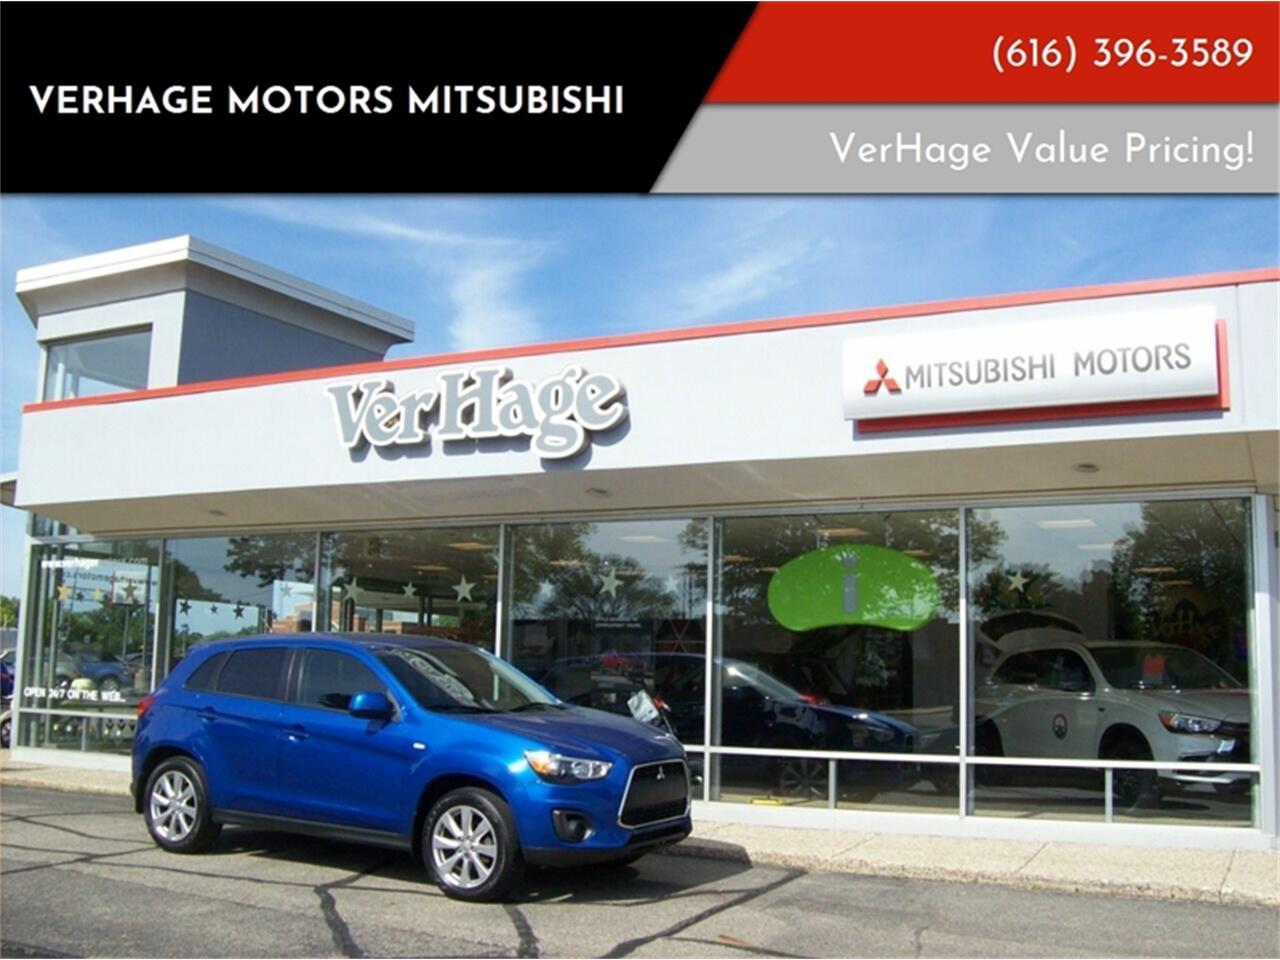 For Sale: 2015 Mitsubishi Outlander in Holland, Michigan